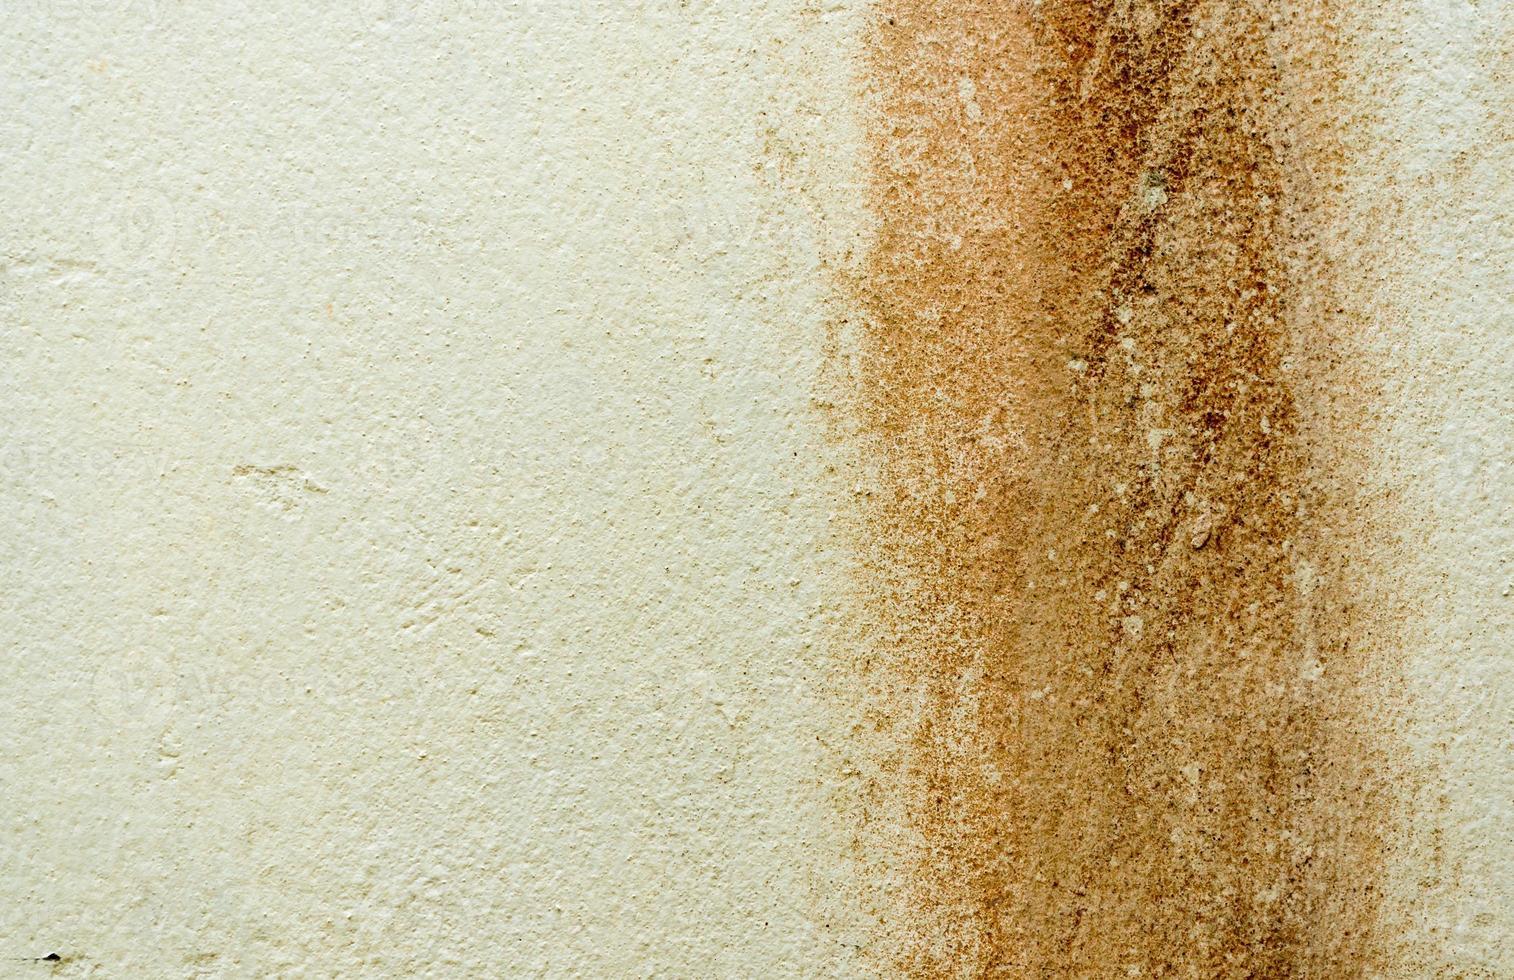 muur textuur en achtergrond foto